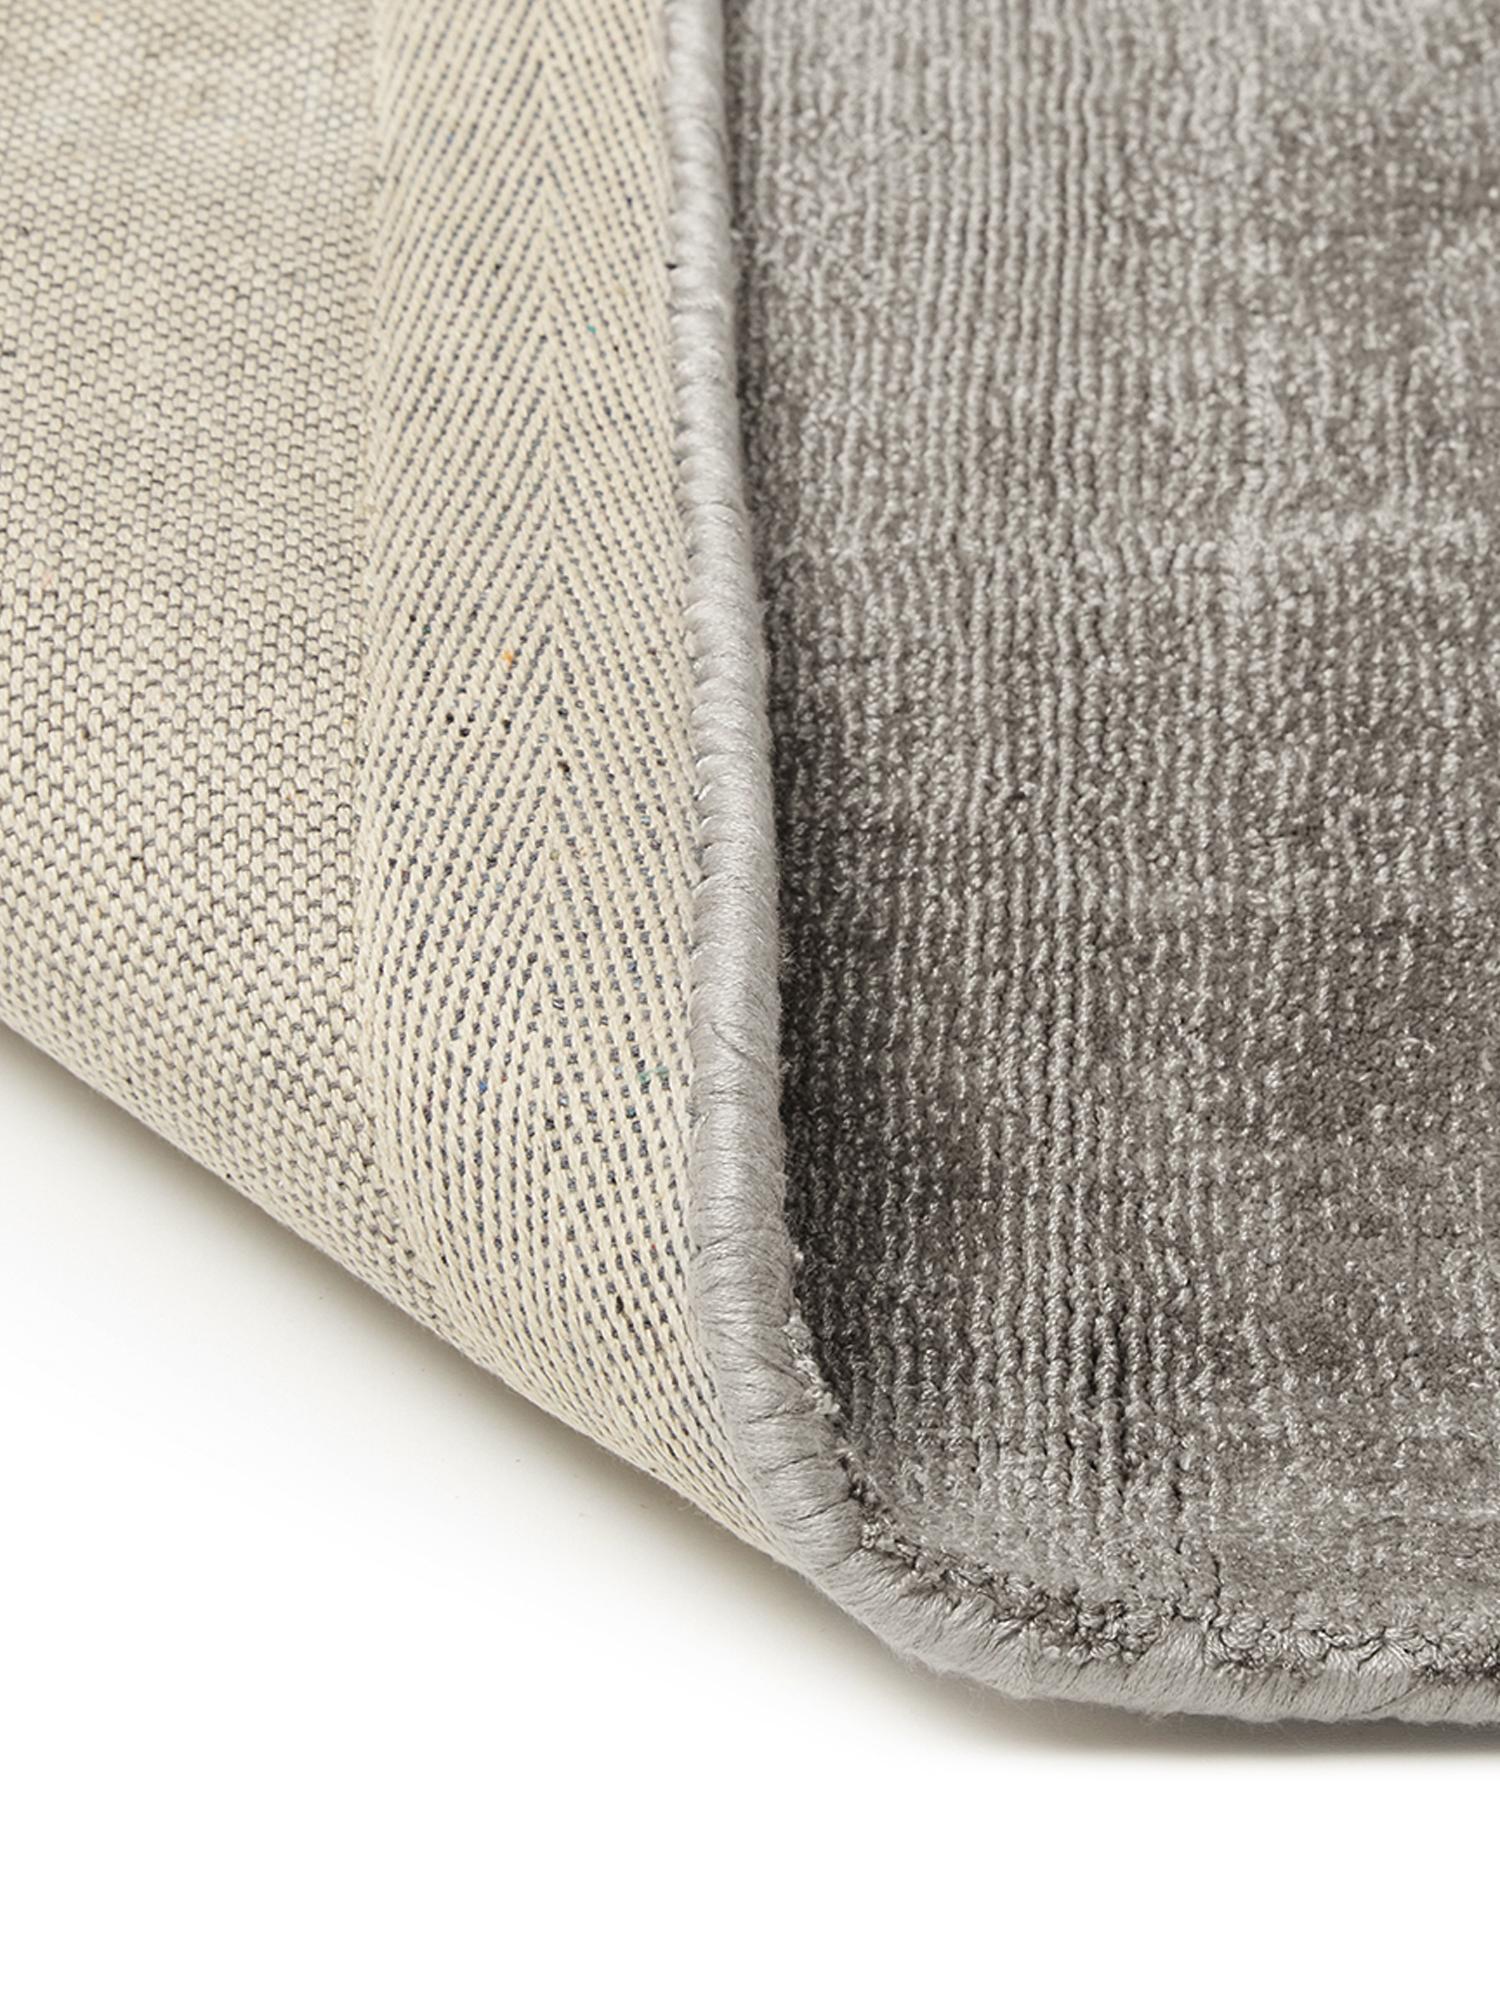 Alfombra artesanal de viscosa Jane, Parte superior: 100%viscosa, Reverso: 100%algodón, Gris pardo, An 120 x L 180 cm (Tamaño S)